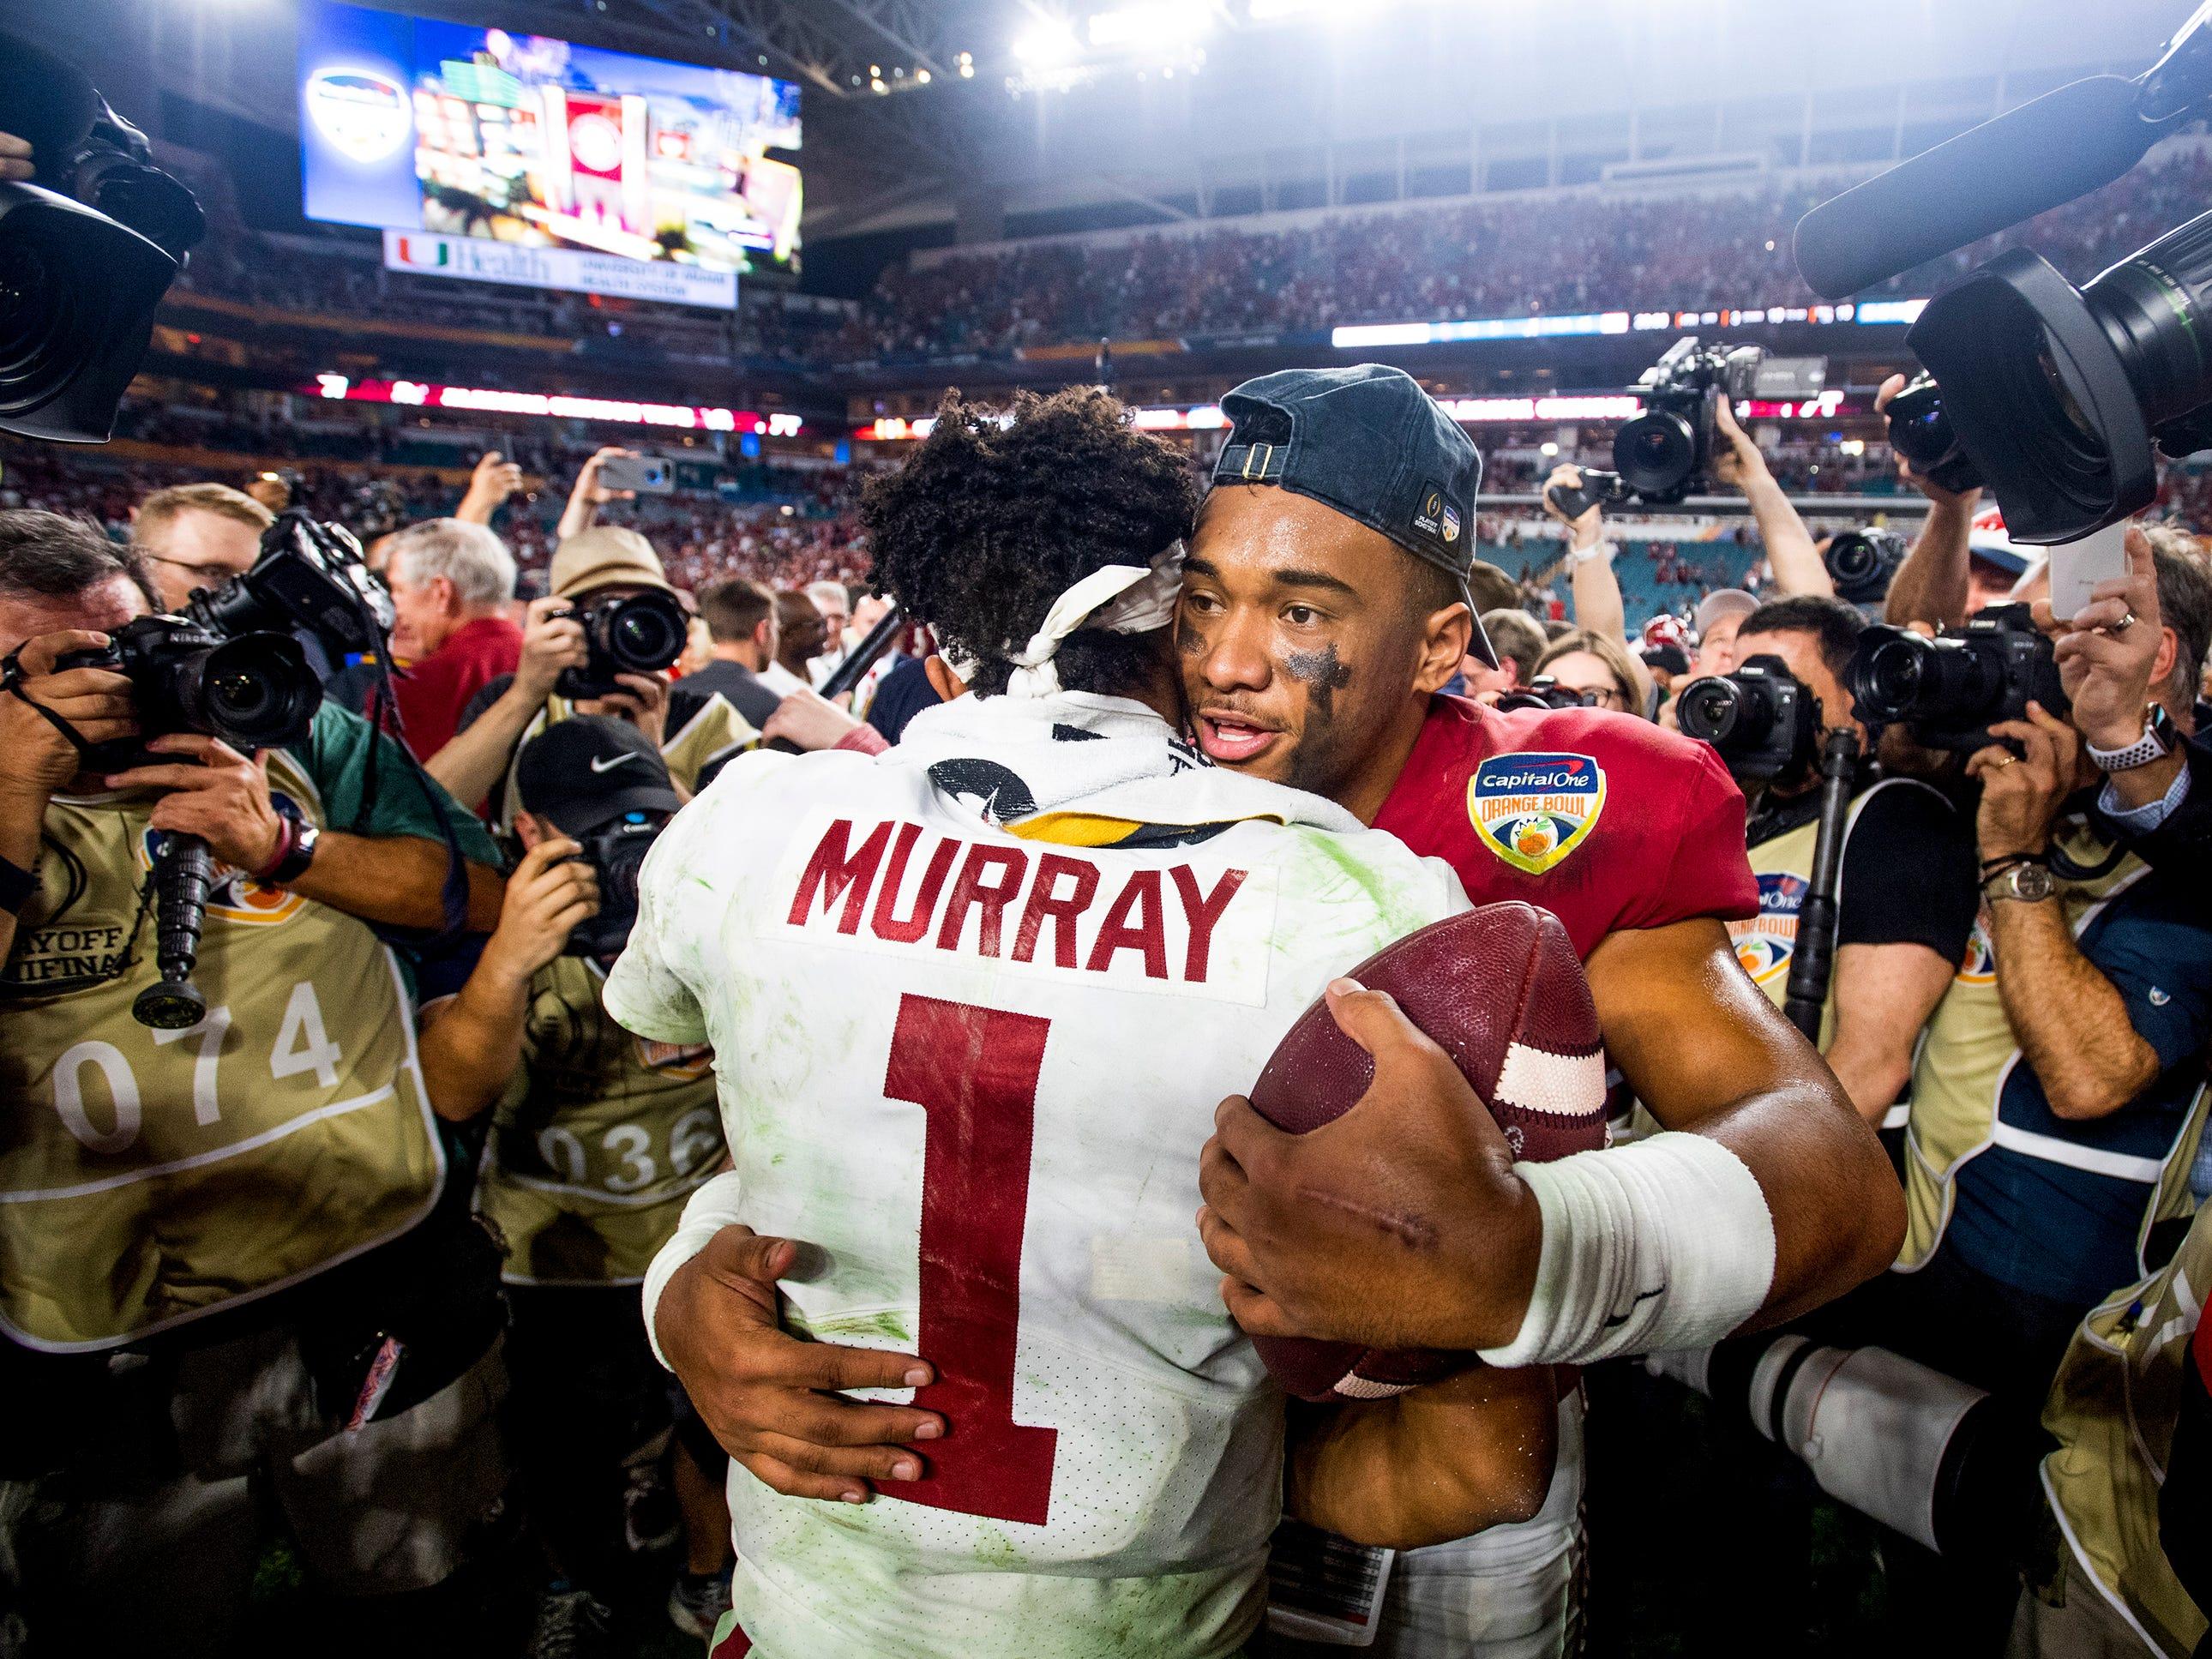 Alabama quarterback Tua Tagovailoa (13) hugs and talks with Oklahoma quarterback Kyler Murray (1) after the Orange Bowl at Hard Rock Stadium in Miami Gardens, Fla., on Saturday December 29, 2018.